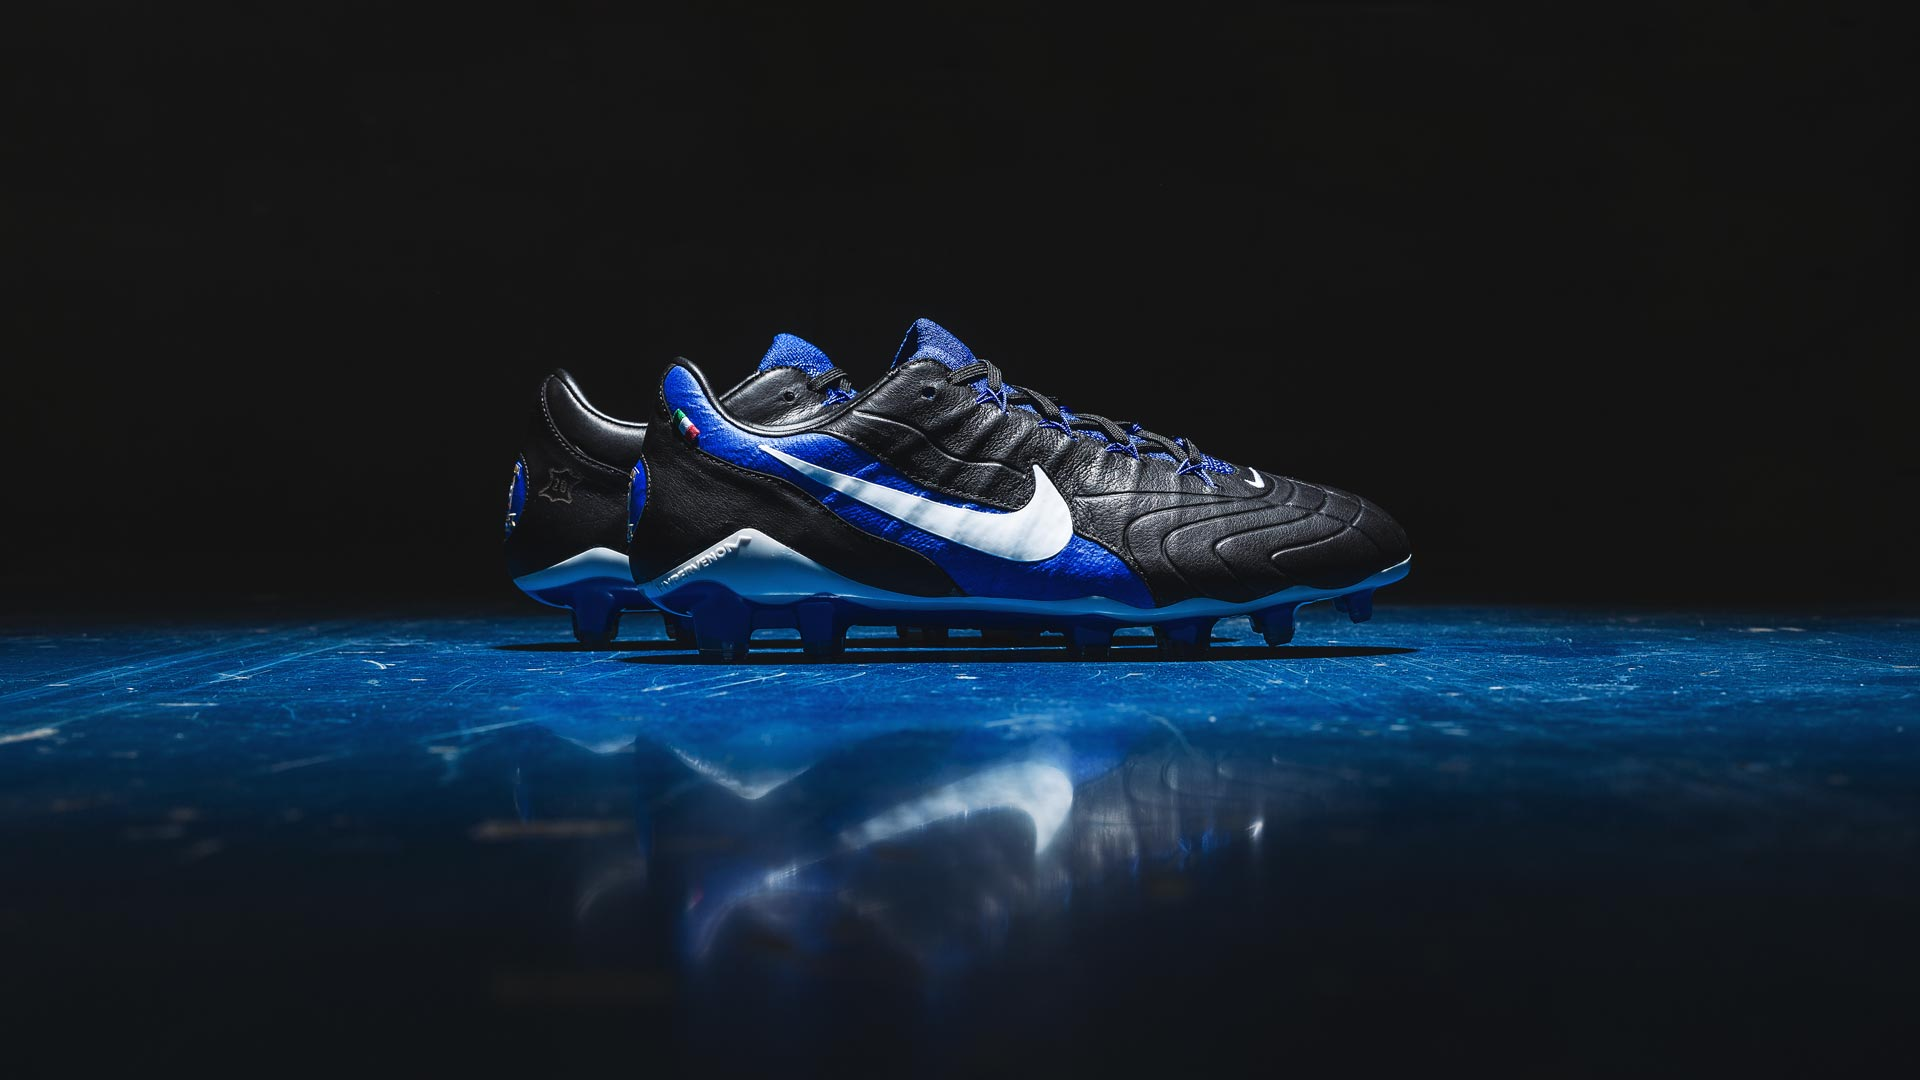 bomba Esta llorando Amperio  Nike Hypervenom GX Limited Edition released